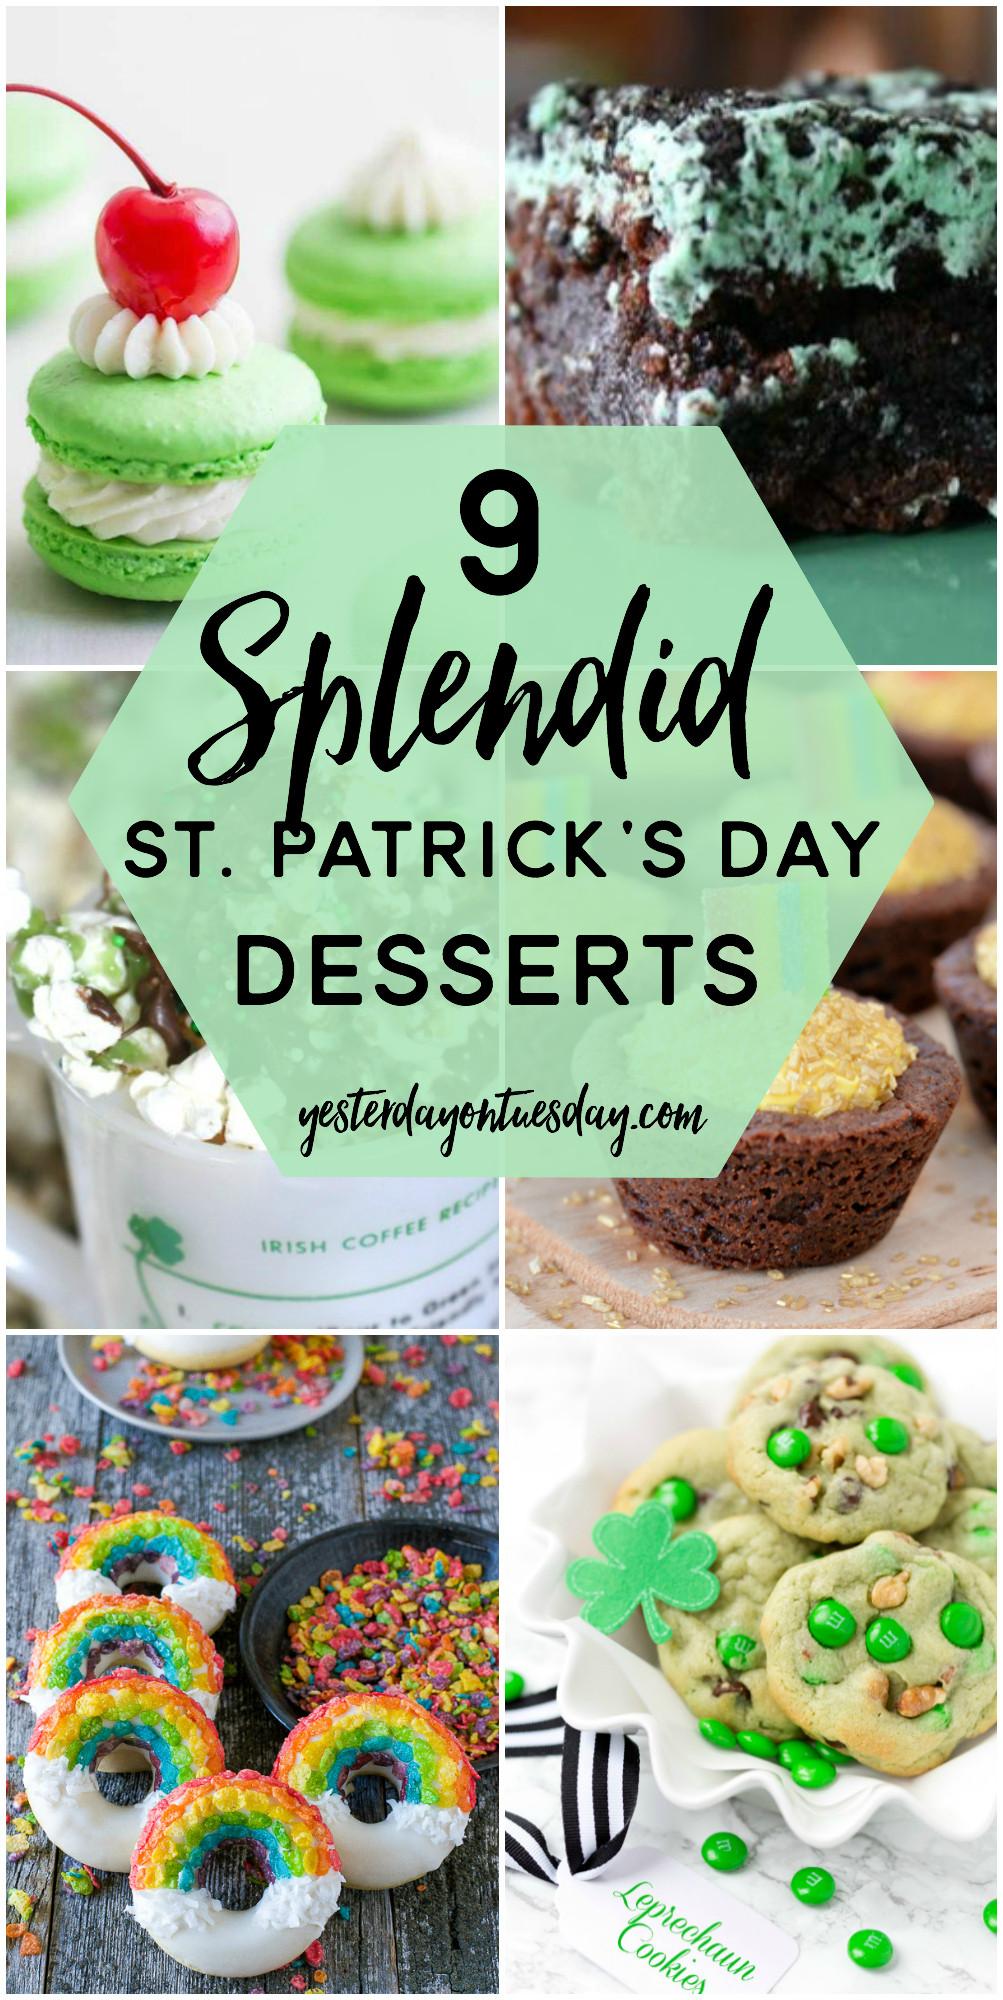 Saint Patrick'S Day Desserts  9 Splendid St Patrick s Day Desserts